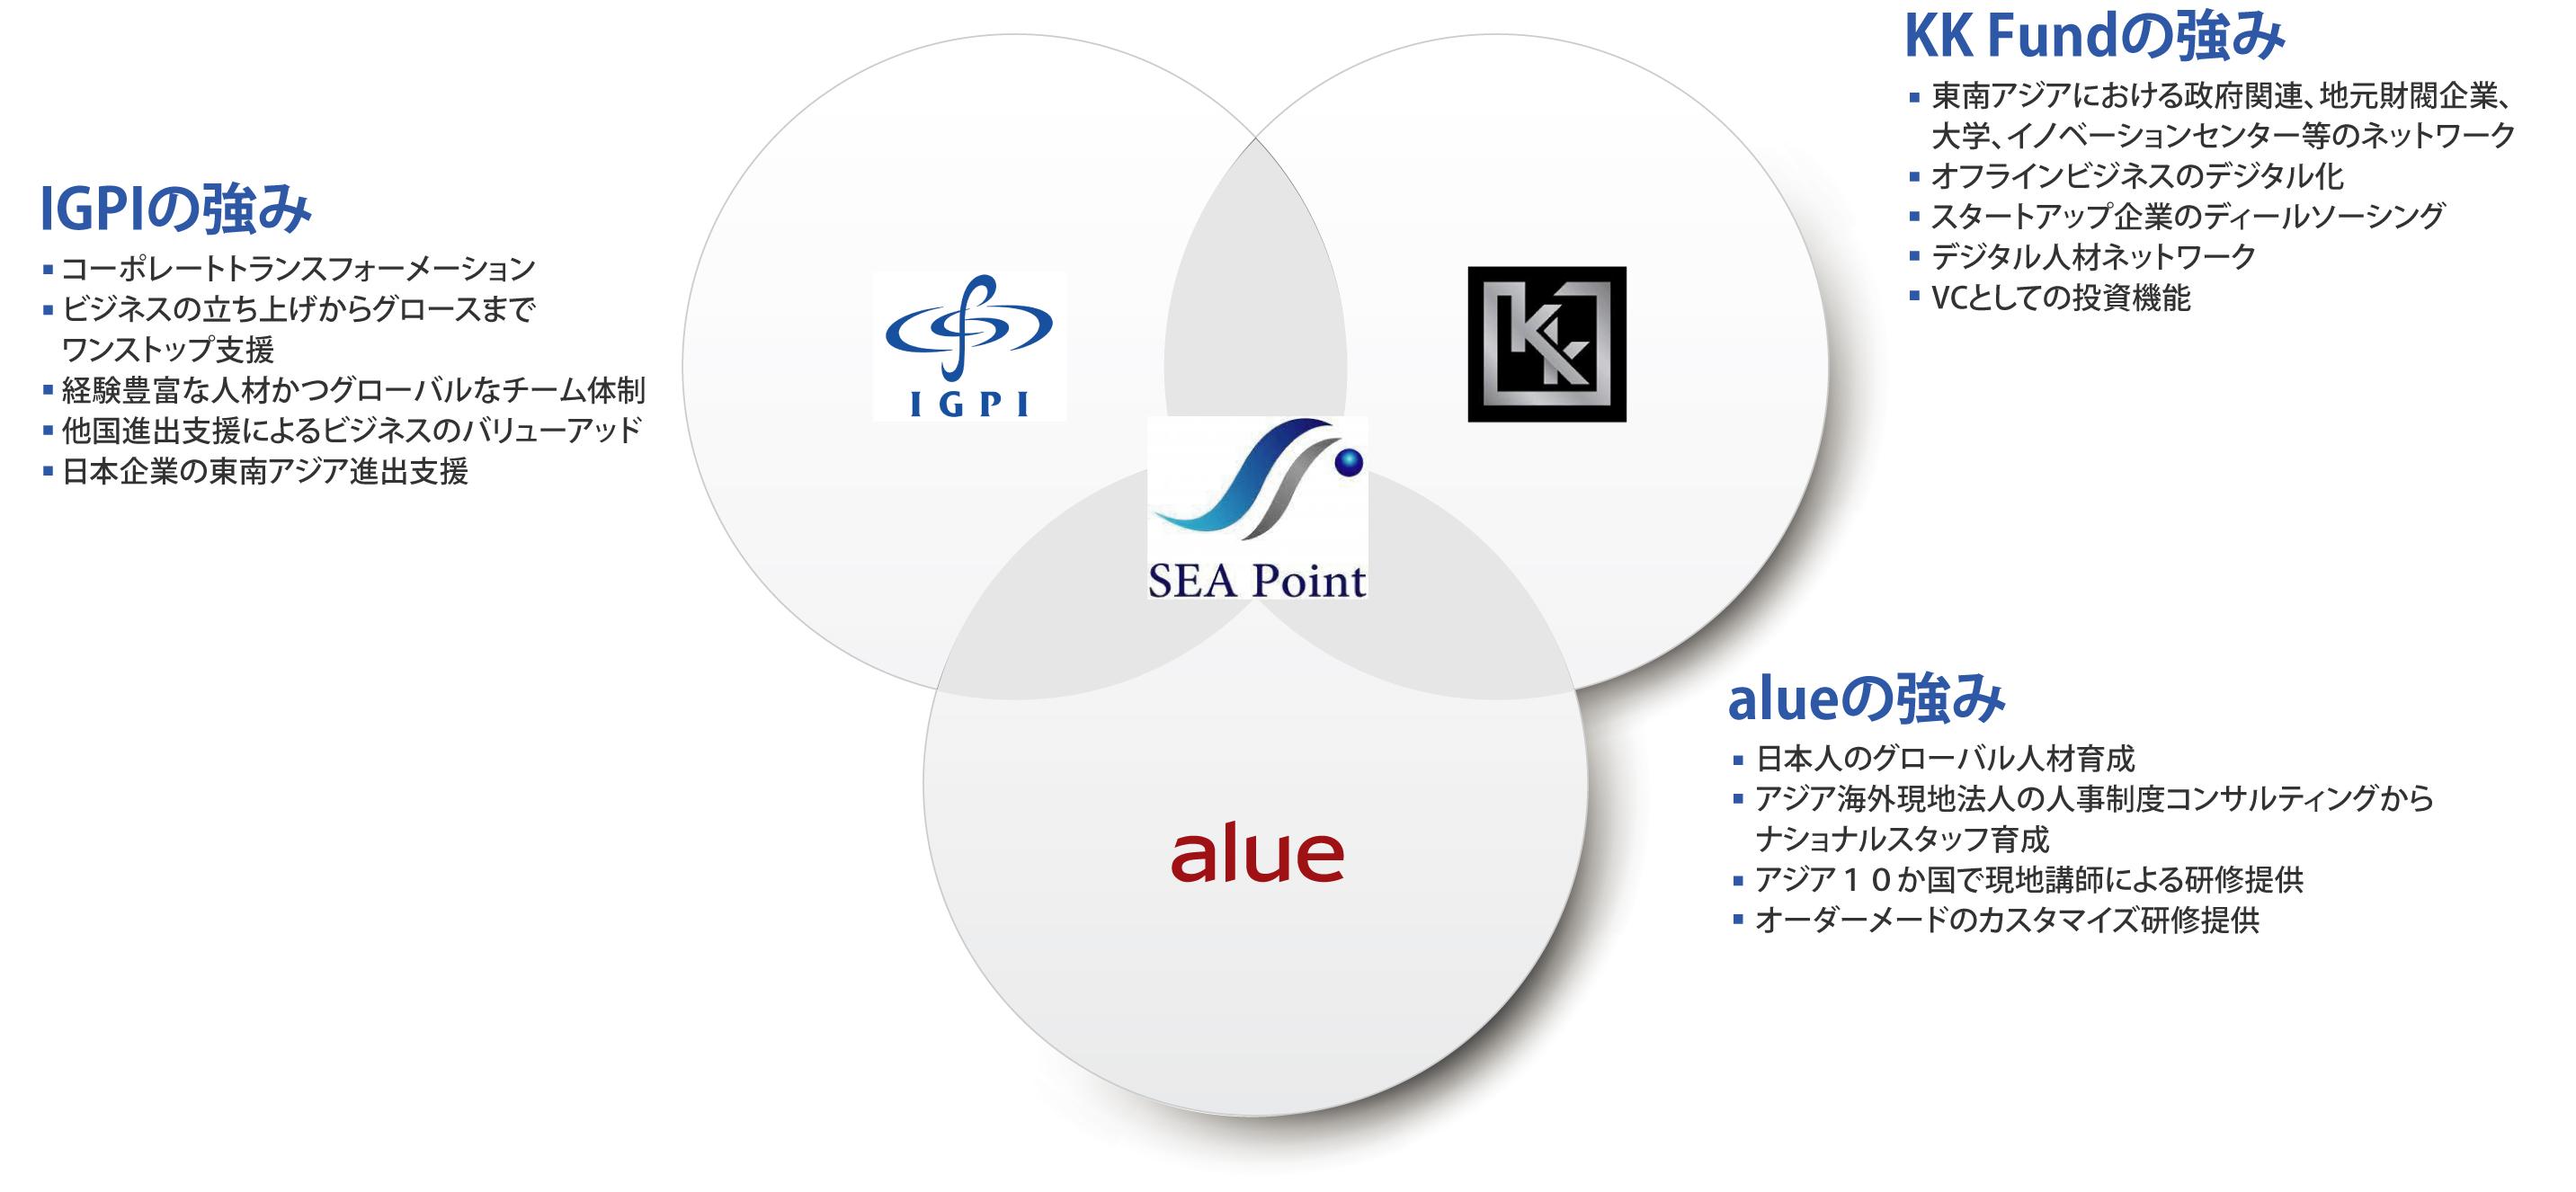 IGPI、KK Fund、alueそれぞれの強み